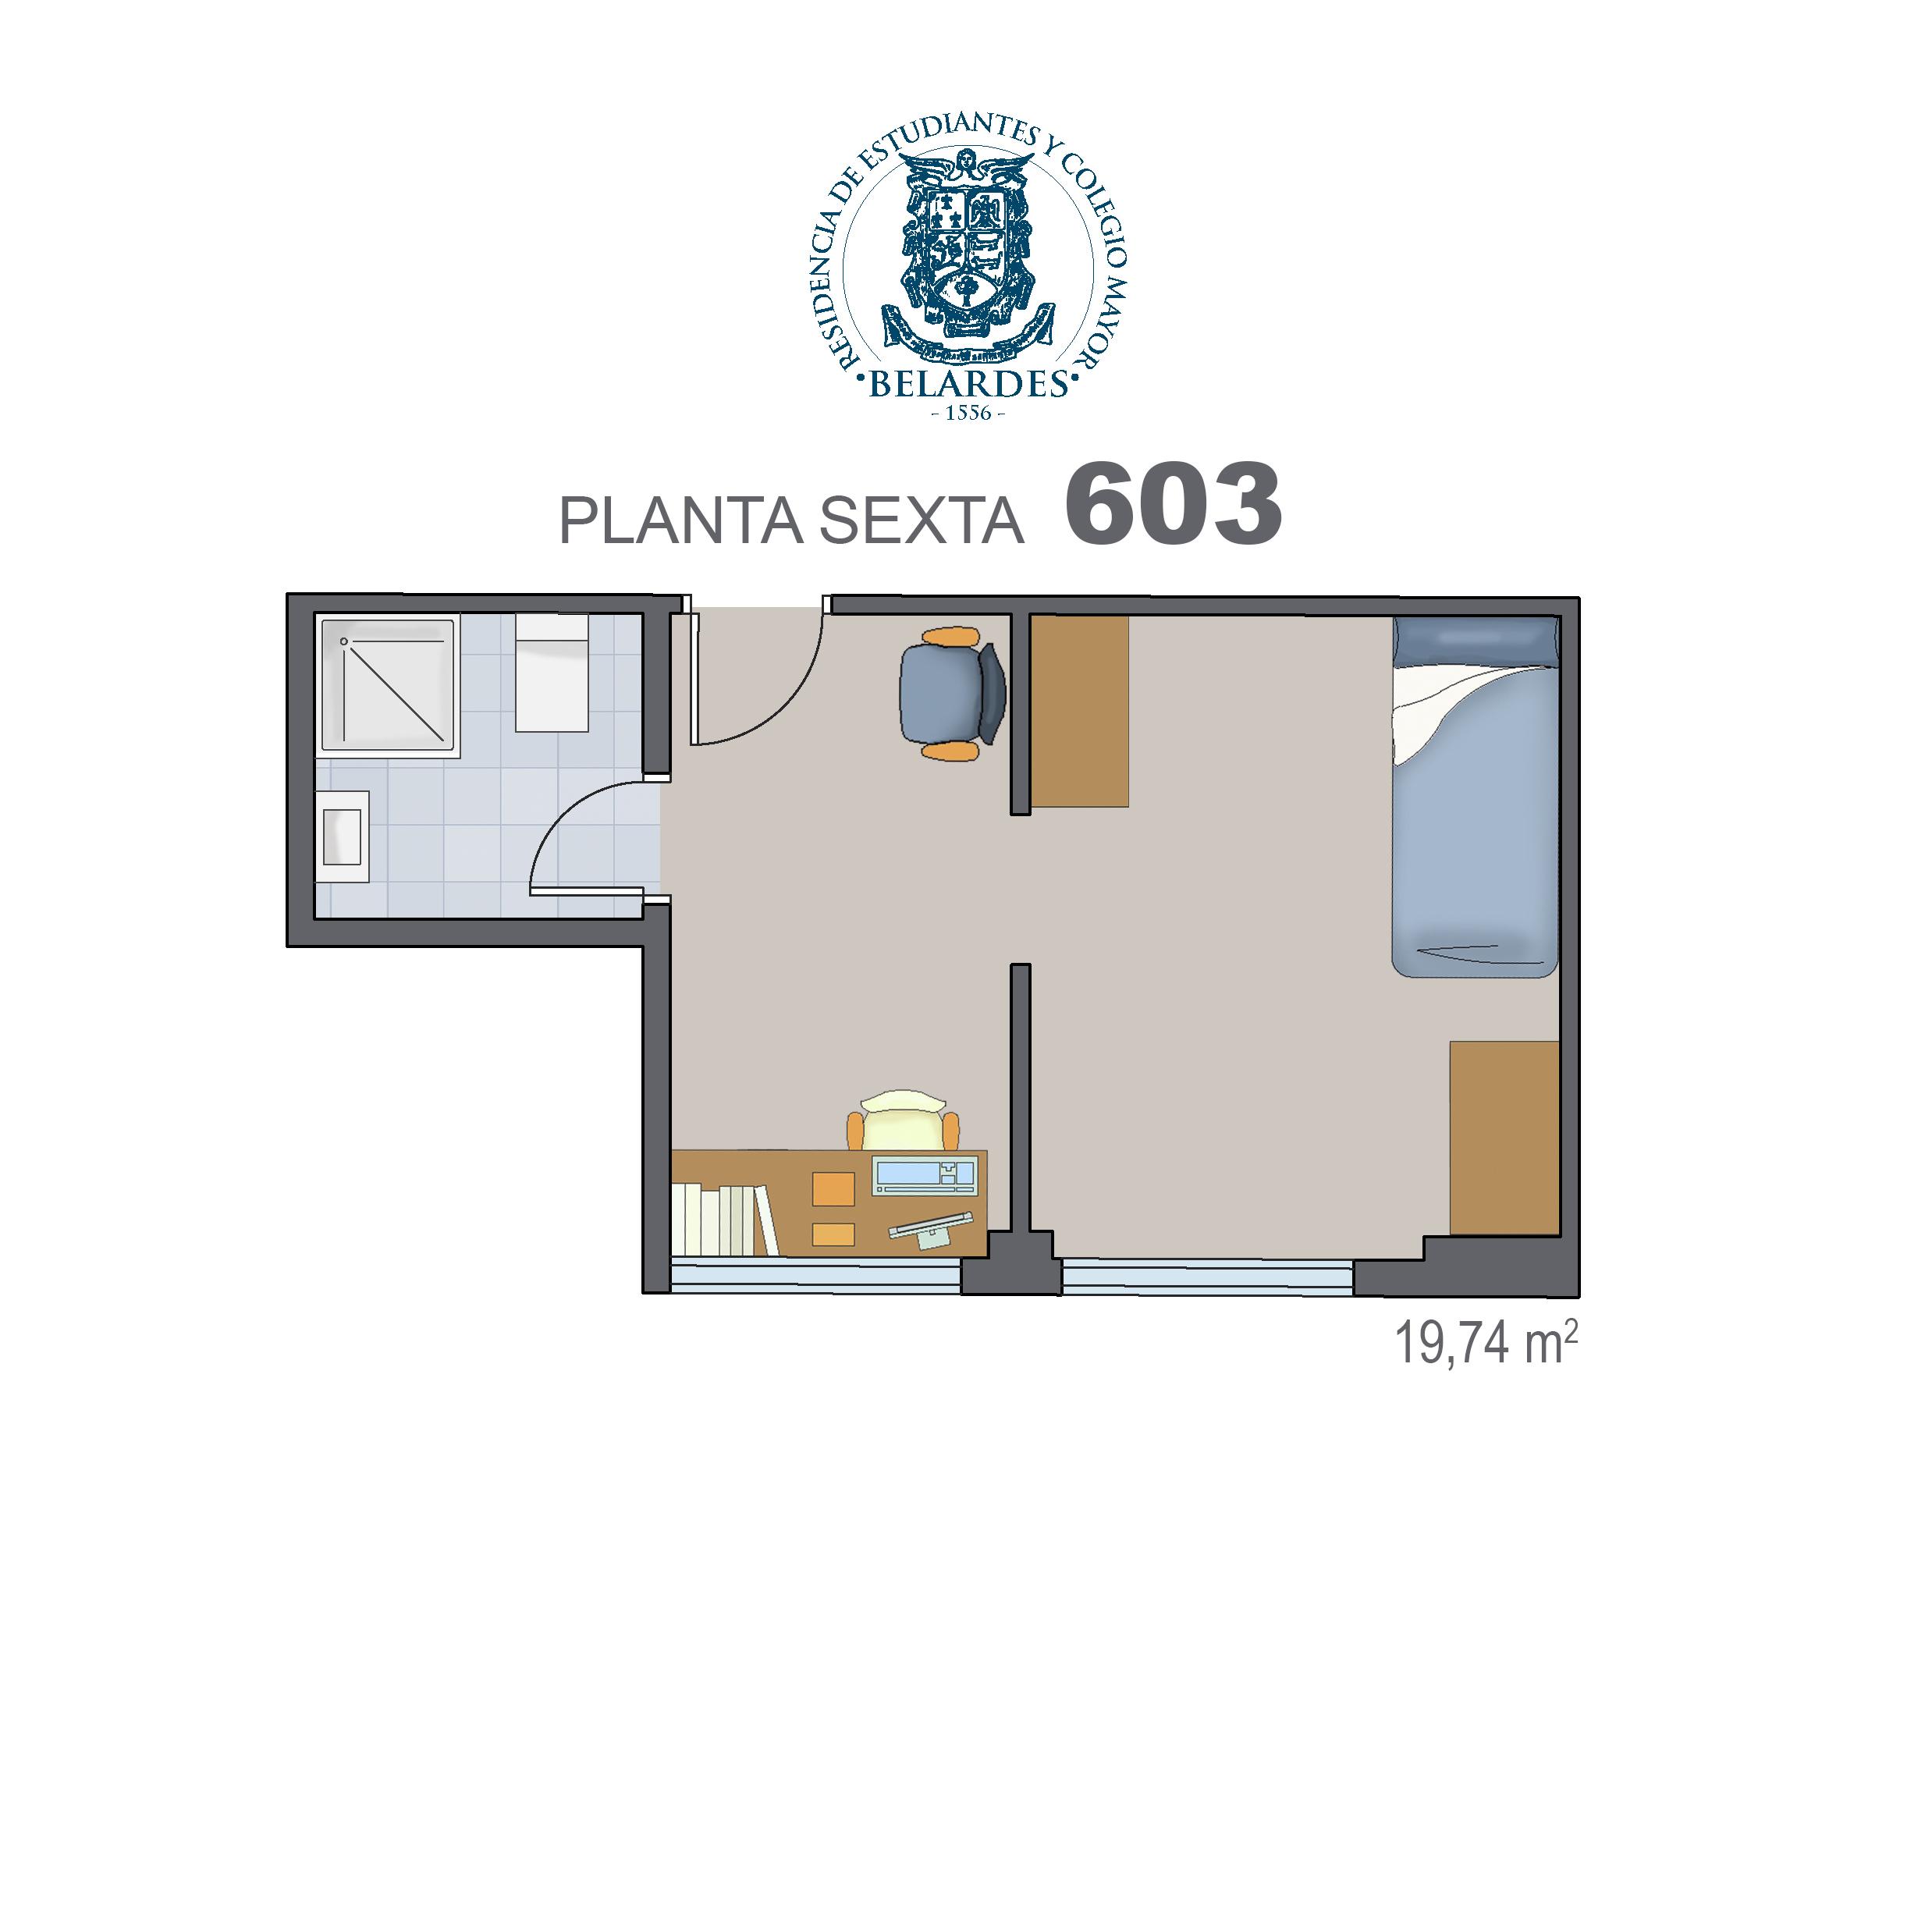 sexta 603